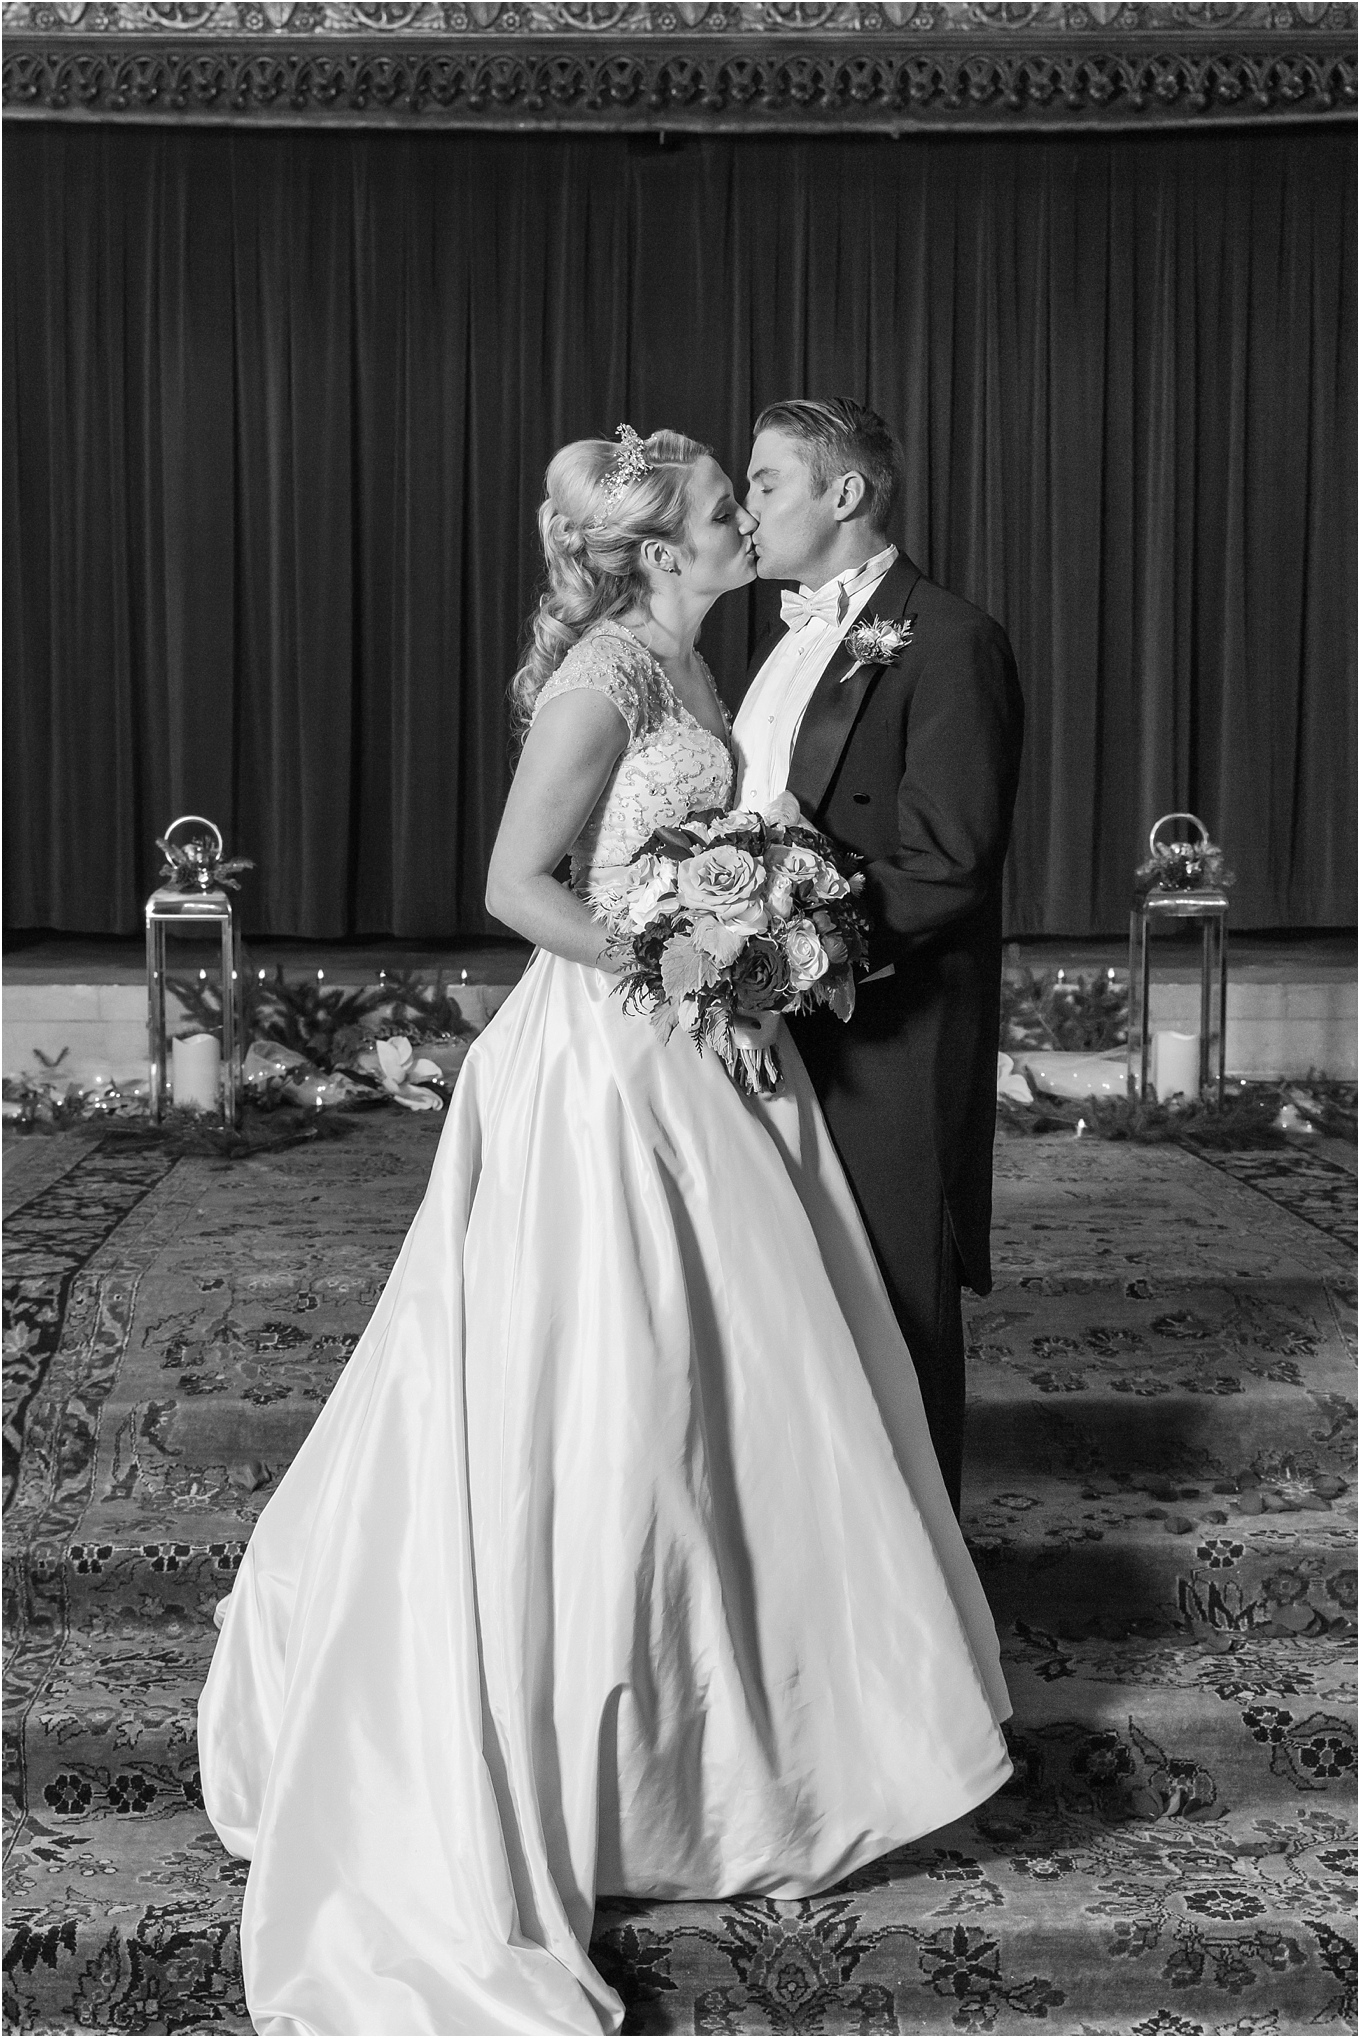 elegant-classic-fairytale-wedding-photos-in-detroit-mi-at-the-masonic-temple-by-courtney-carolyn-photography_0115.jpg